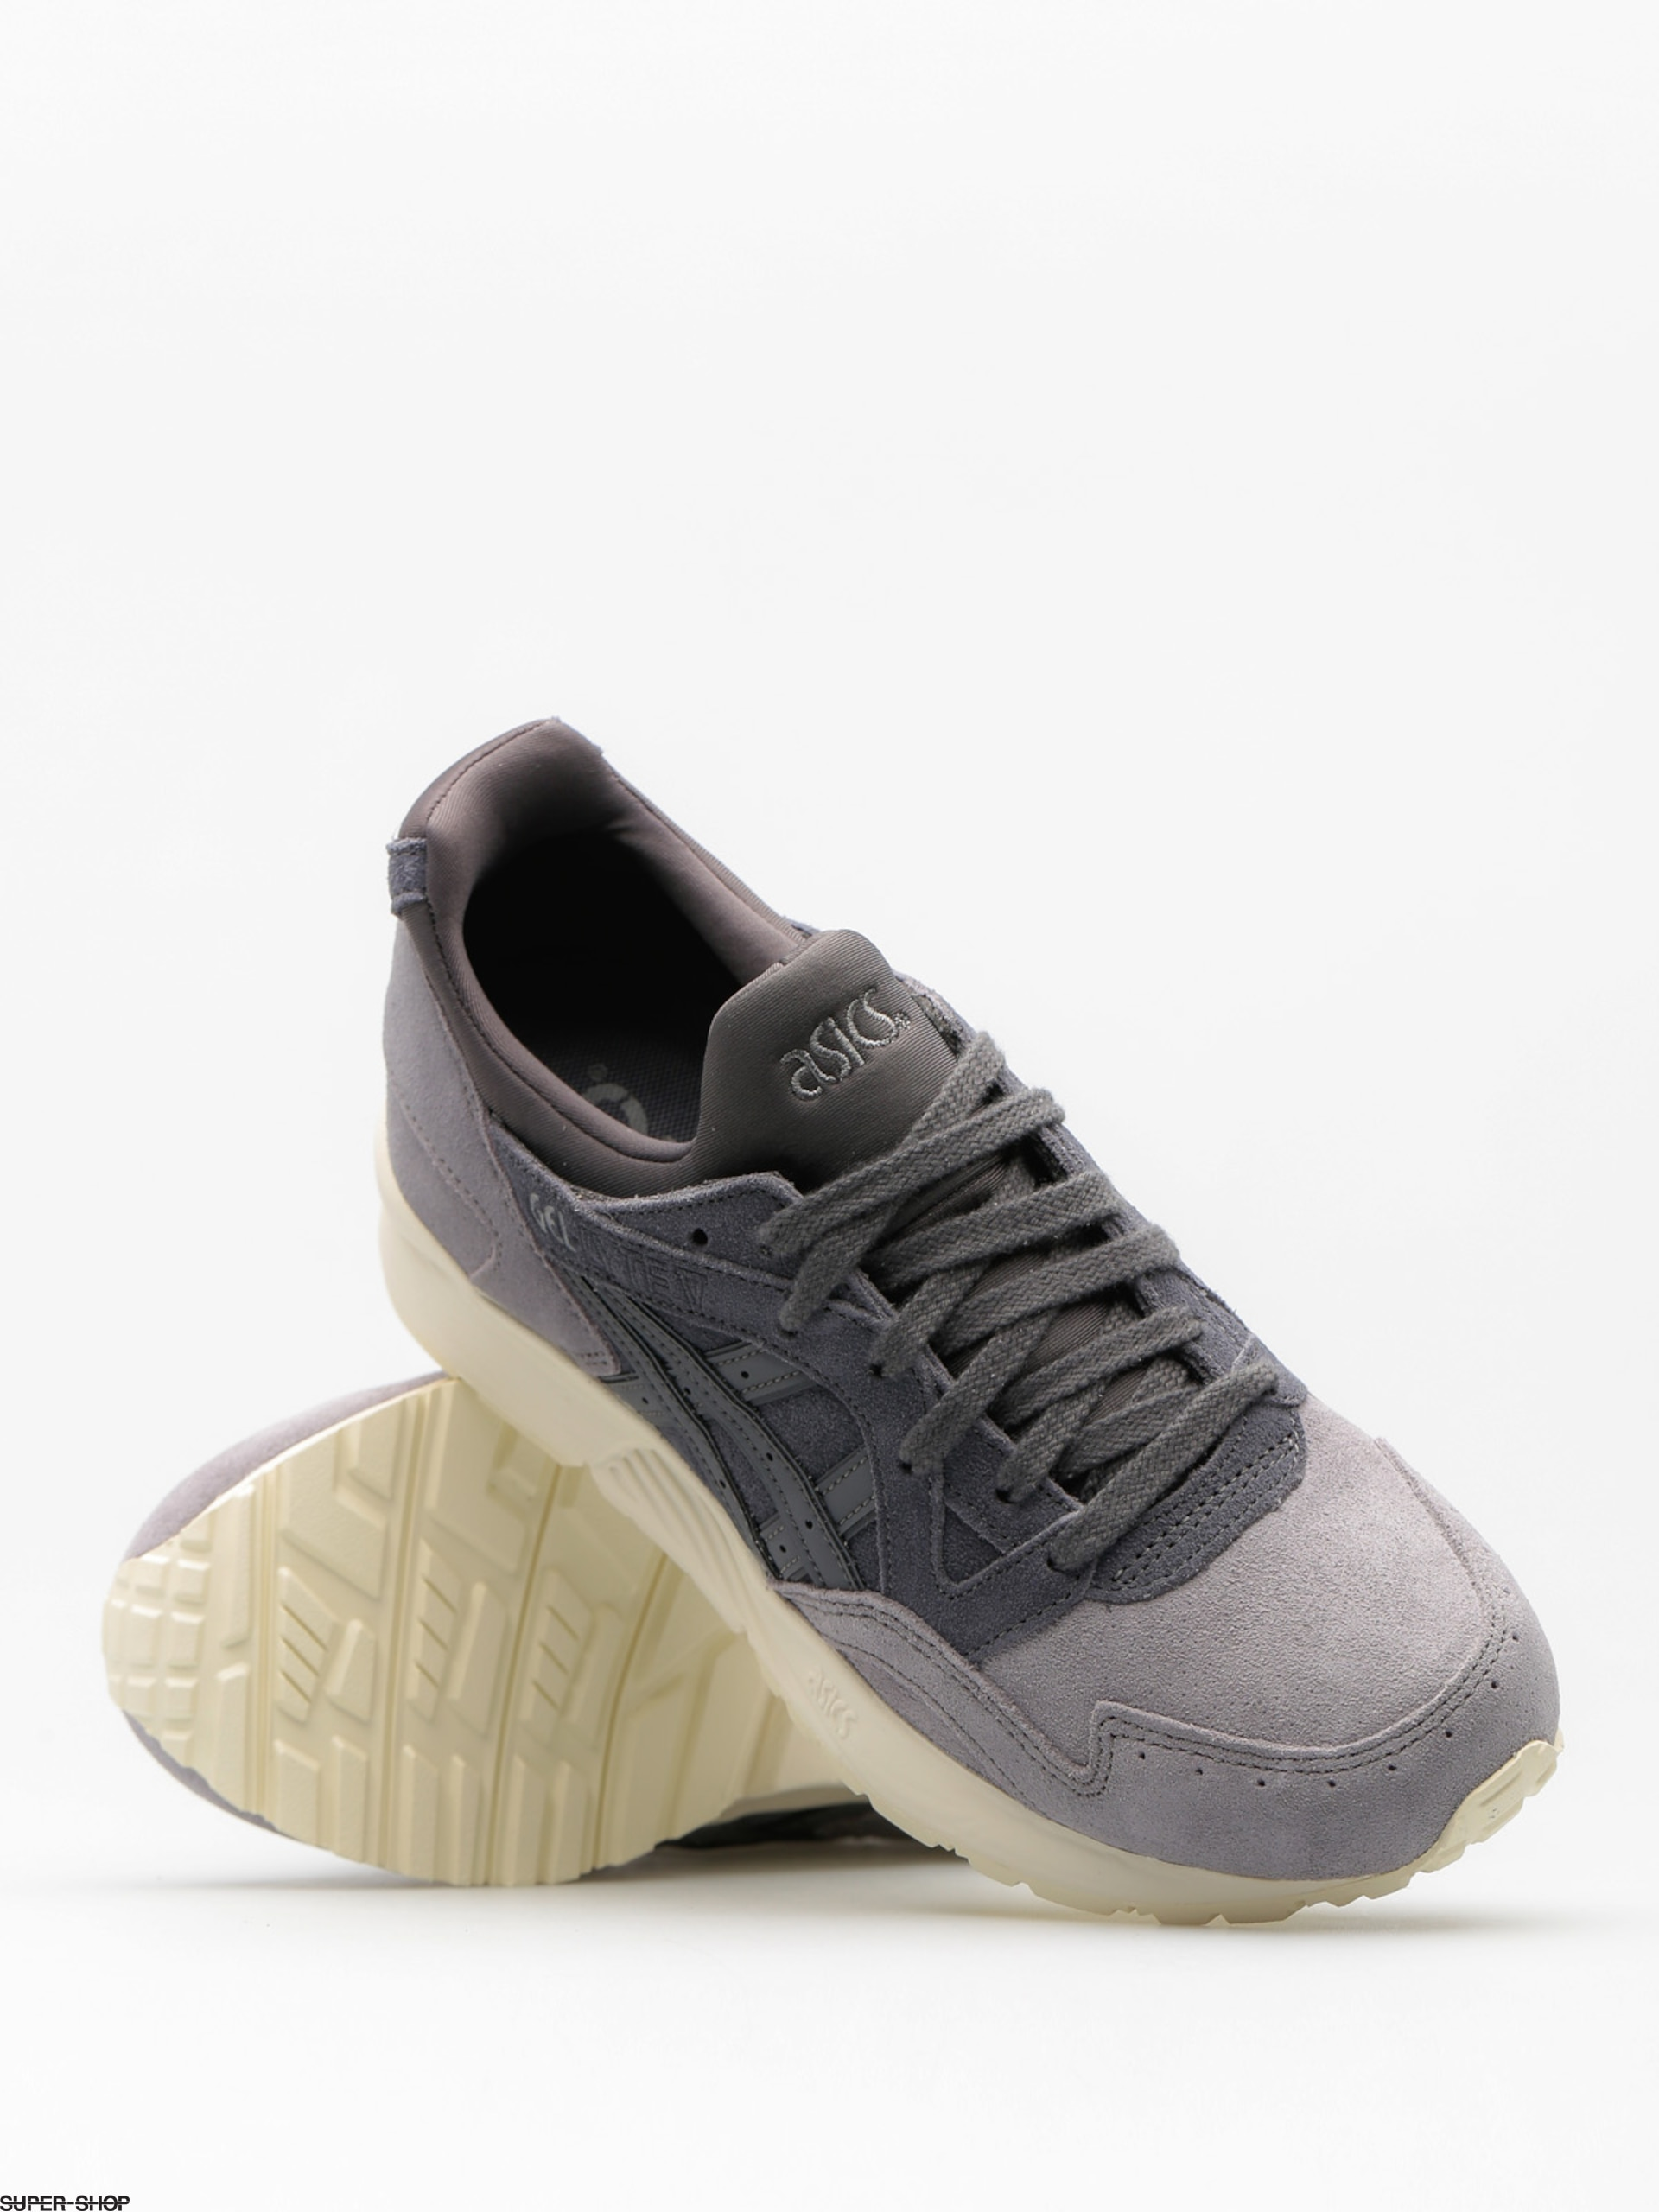 Asics V Shoes Wmn Gel carboncarbon Tiger Lyte xZzZwqSP7 4b08d12701ad